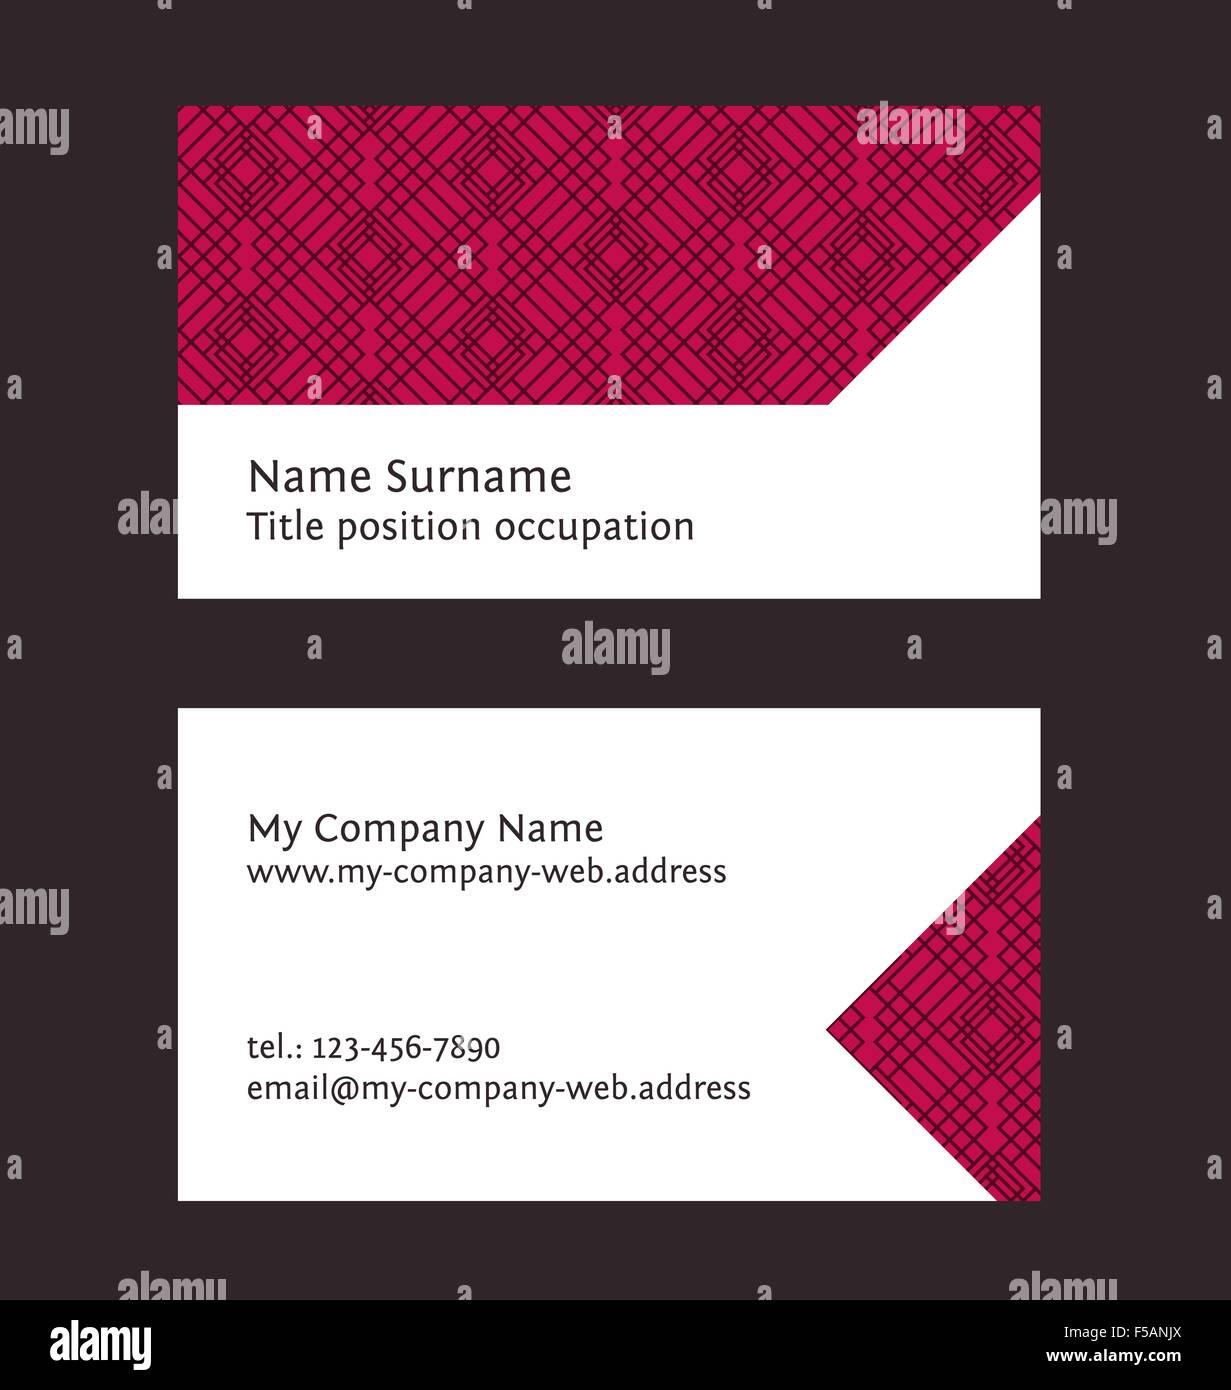 Business card layout linear geometric pattern editable design business card layout linear geometric pattern editable design template flashek Choice Image